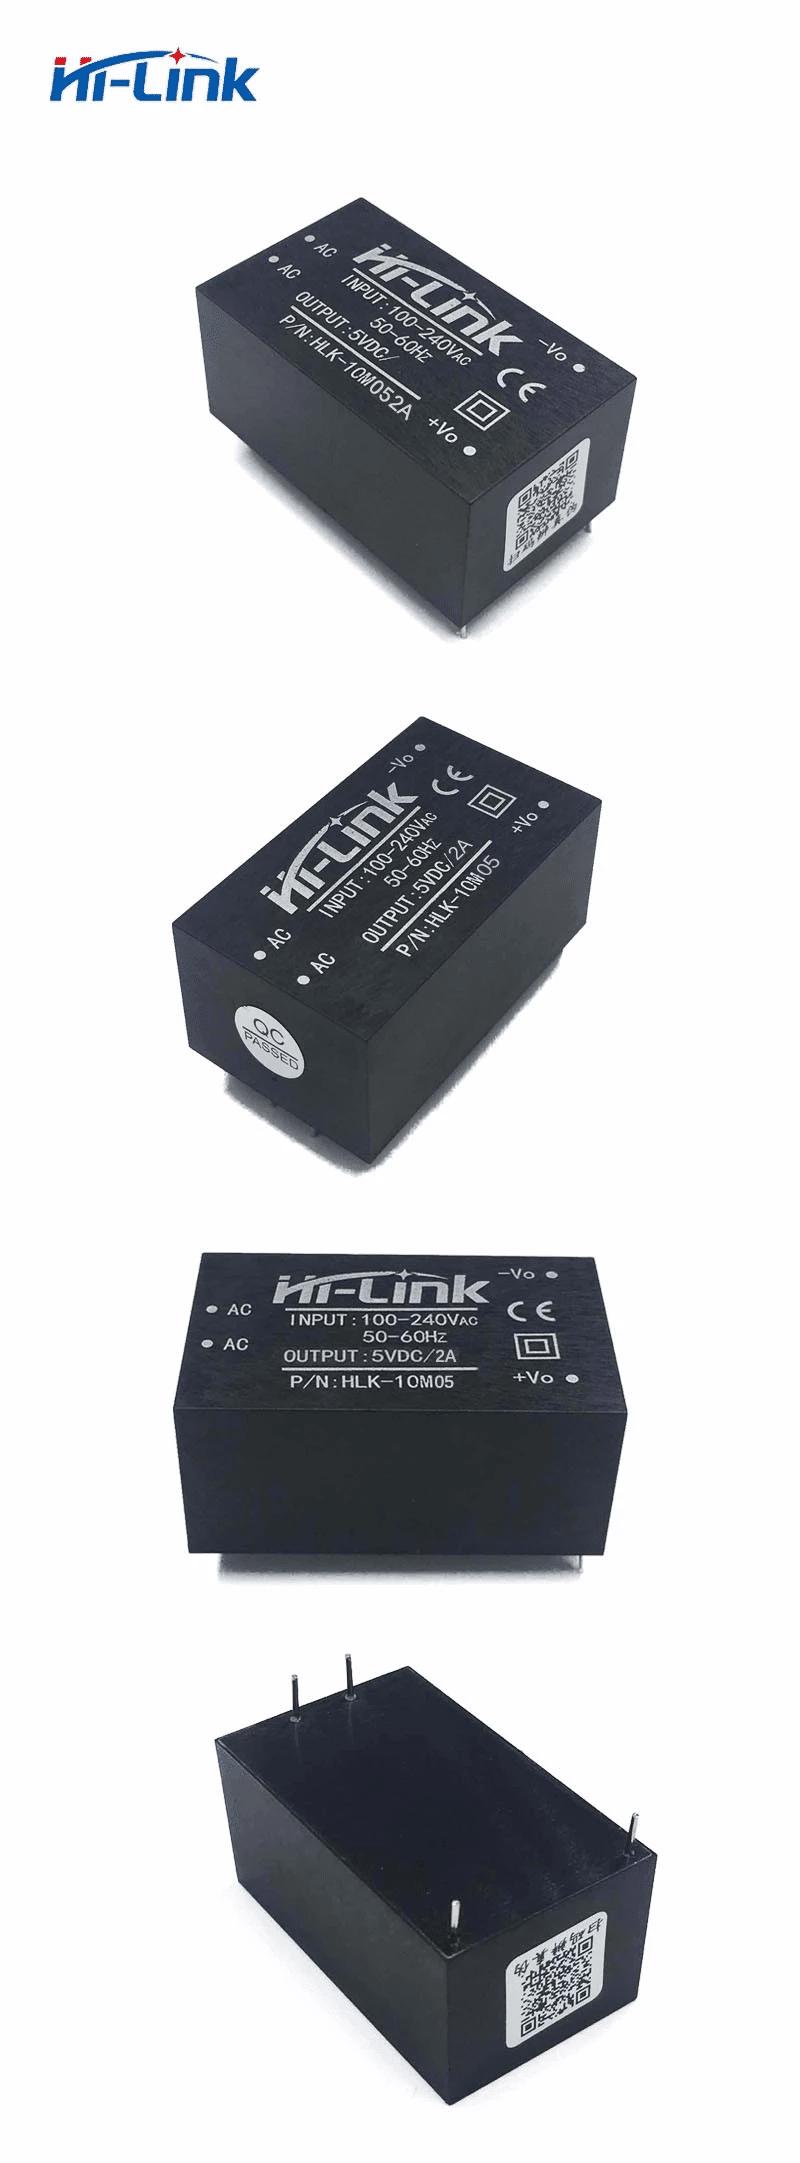 HLK-10M05